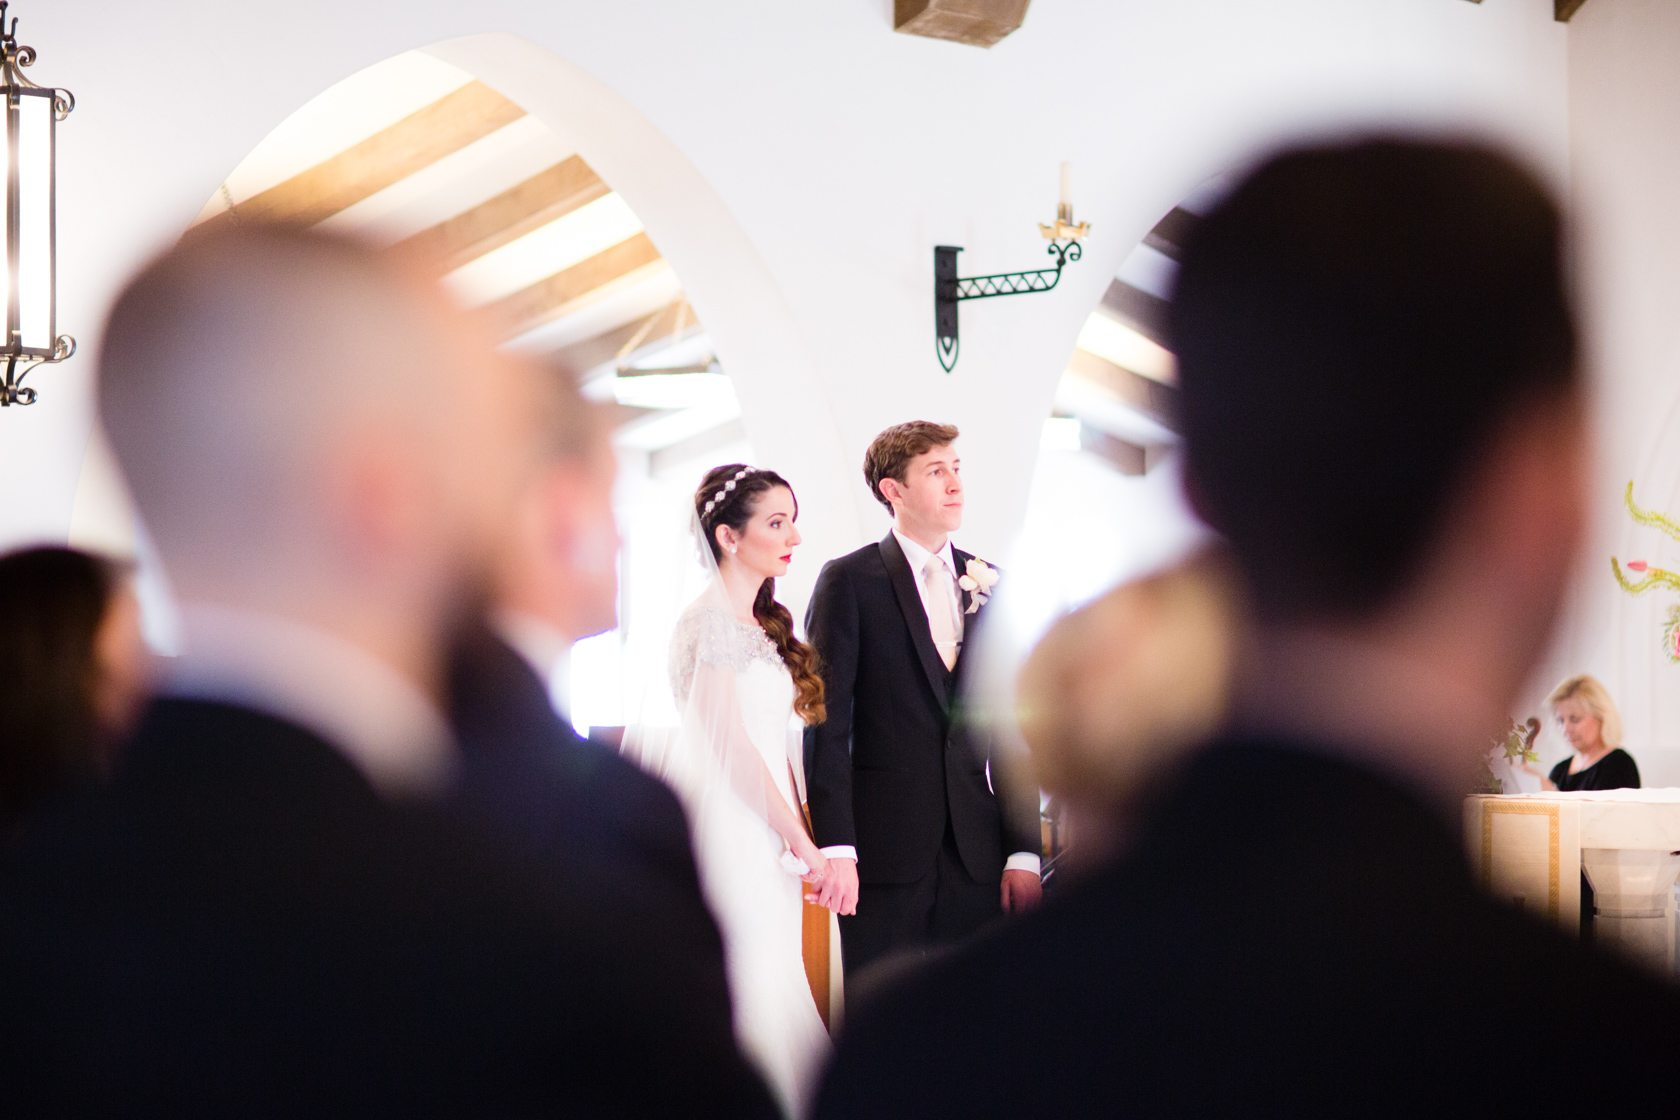 Darlington_House_Wedding_061.jpg